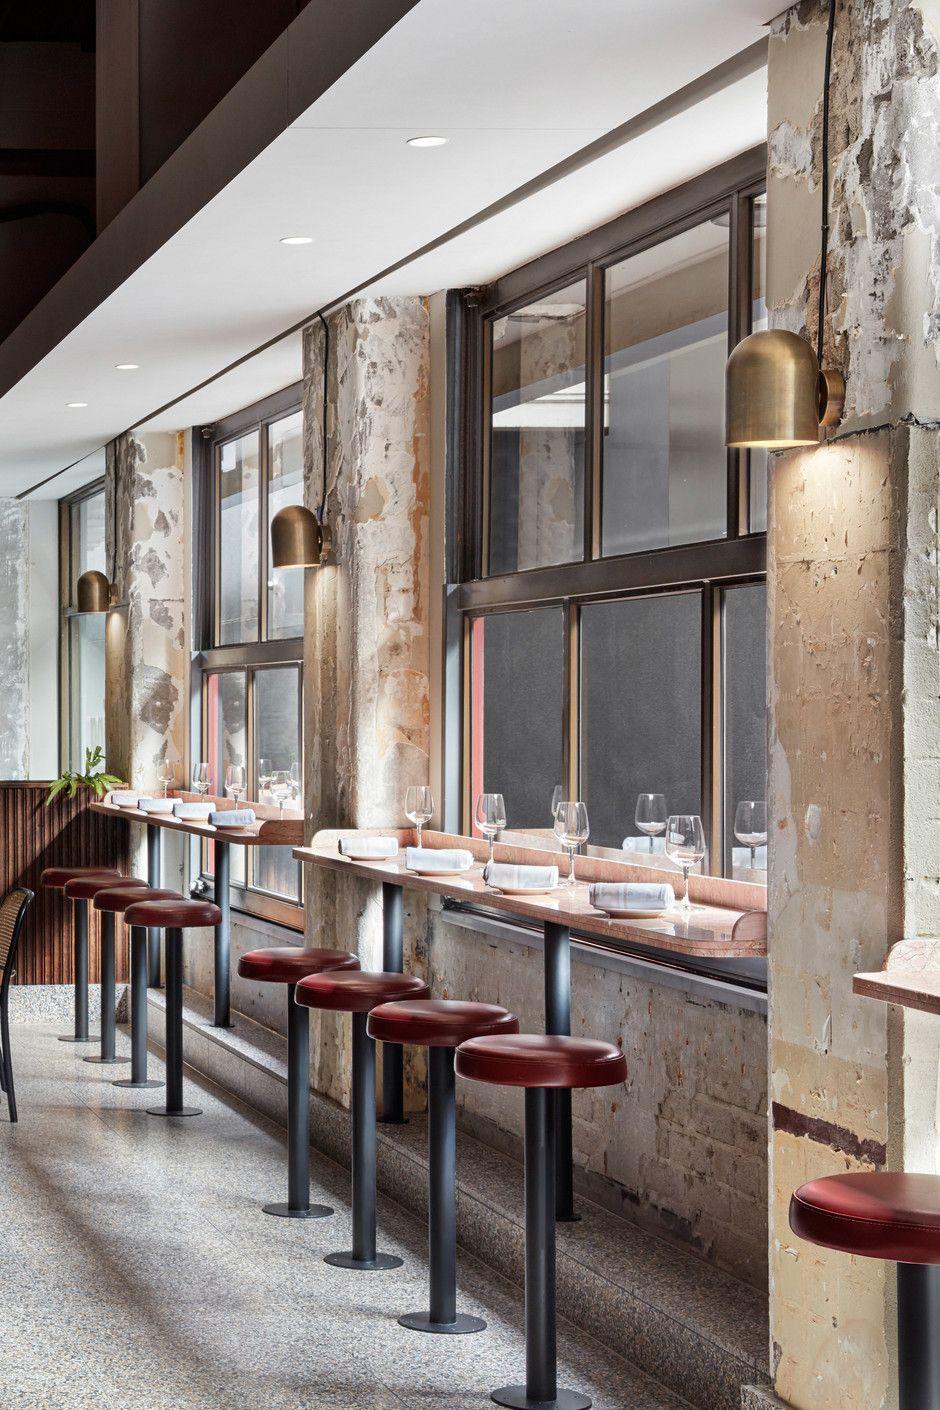 Vintage Industrial Bar And Restaurant Designs Restaurant Seating Restaurant Interior Restaurant Decor